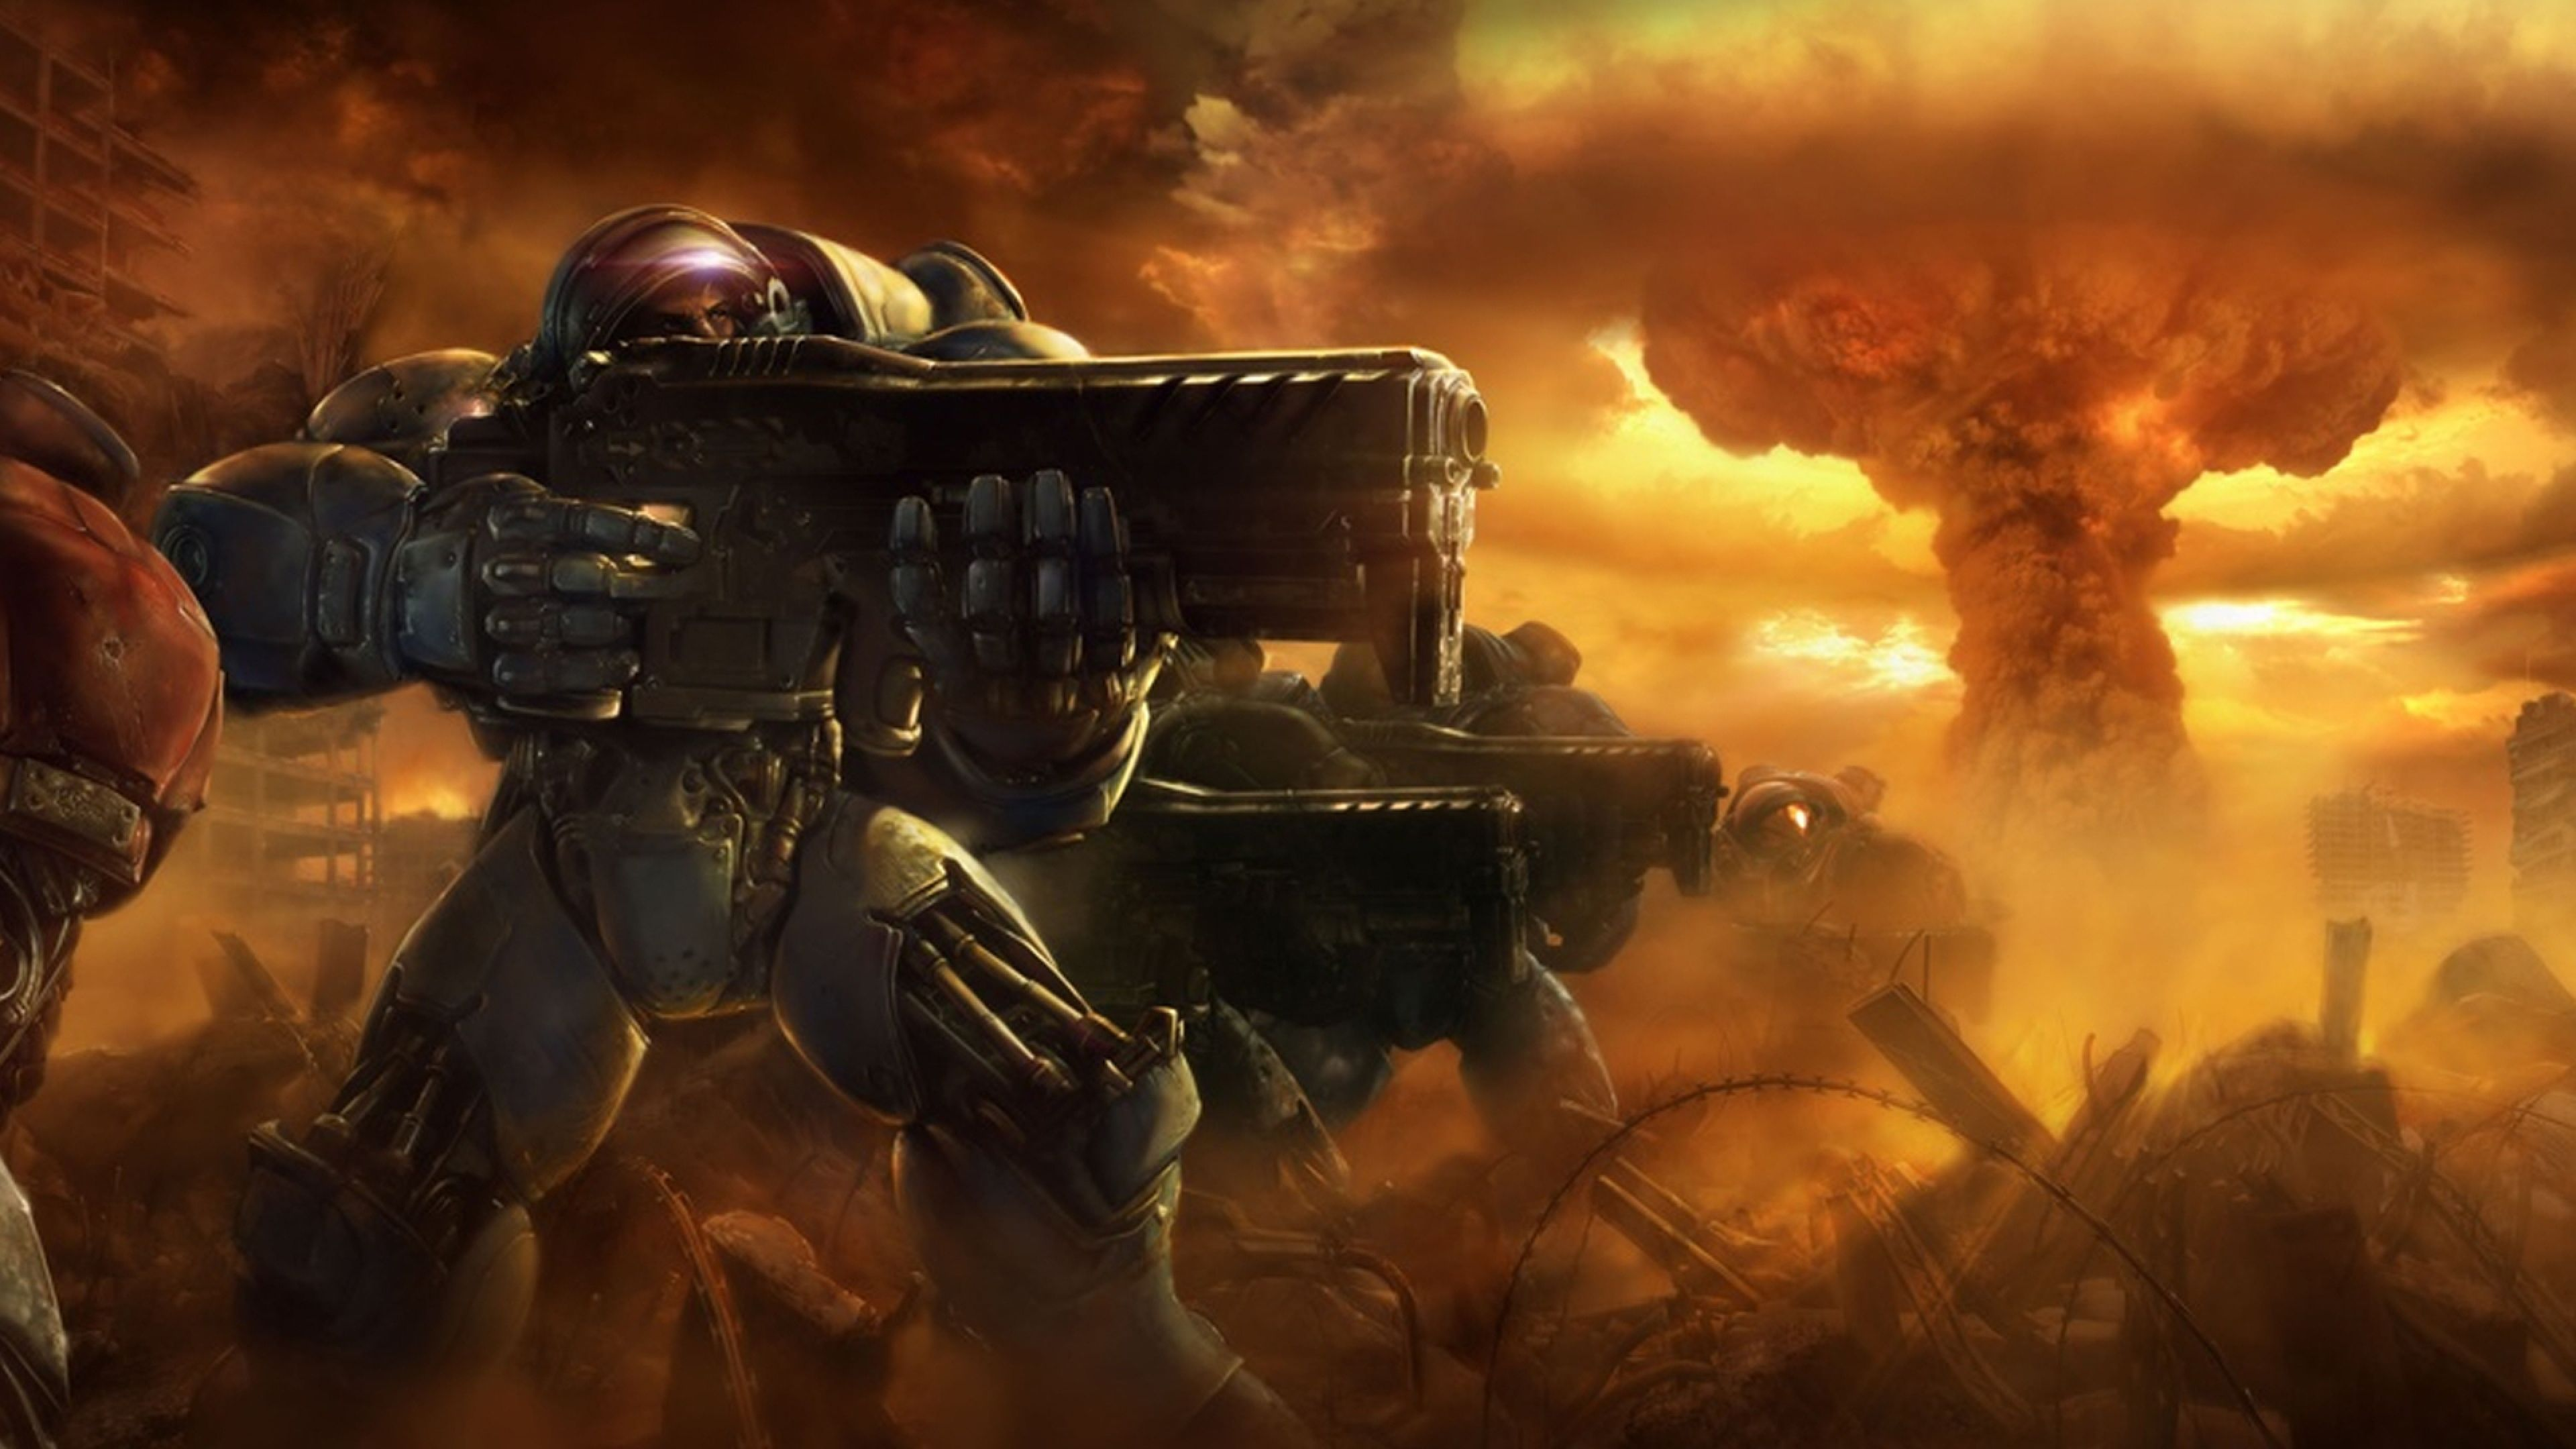 StarCraft 2 4K Ultra HD Wallpapers   Top StarCraft 2 4K Ultra 3840x2160